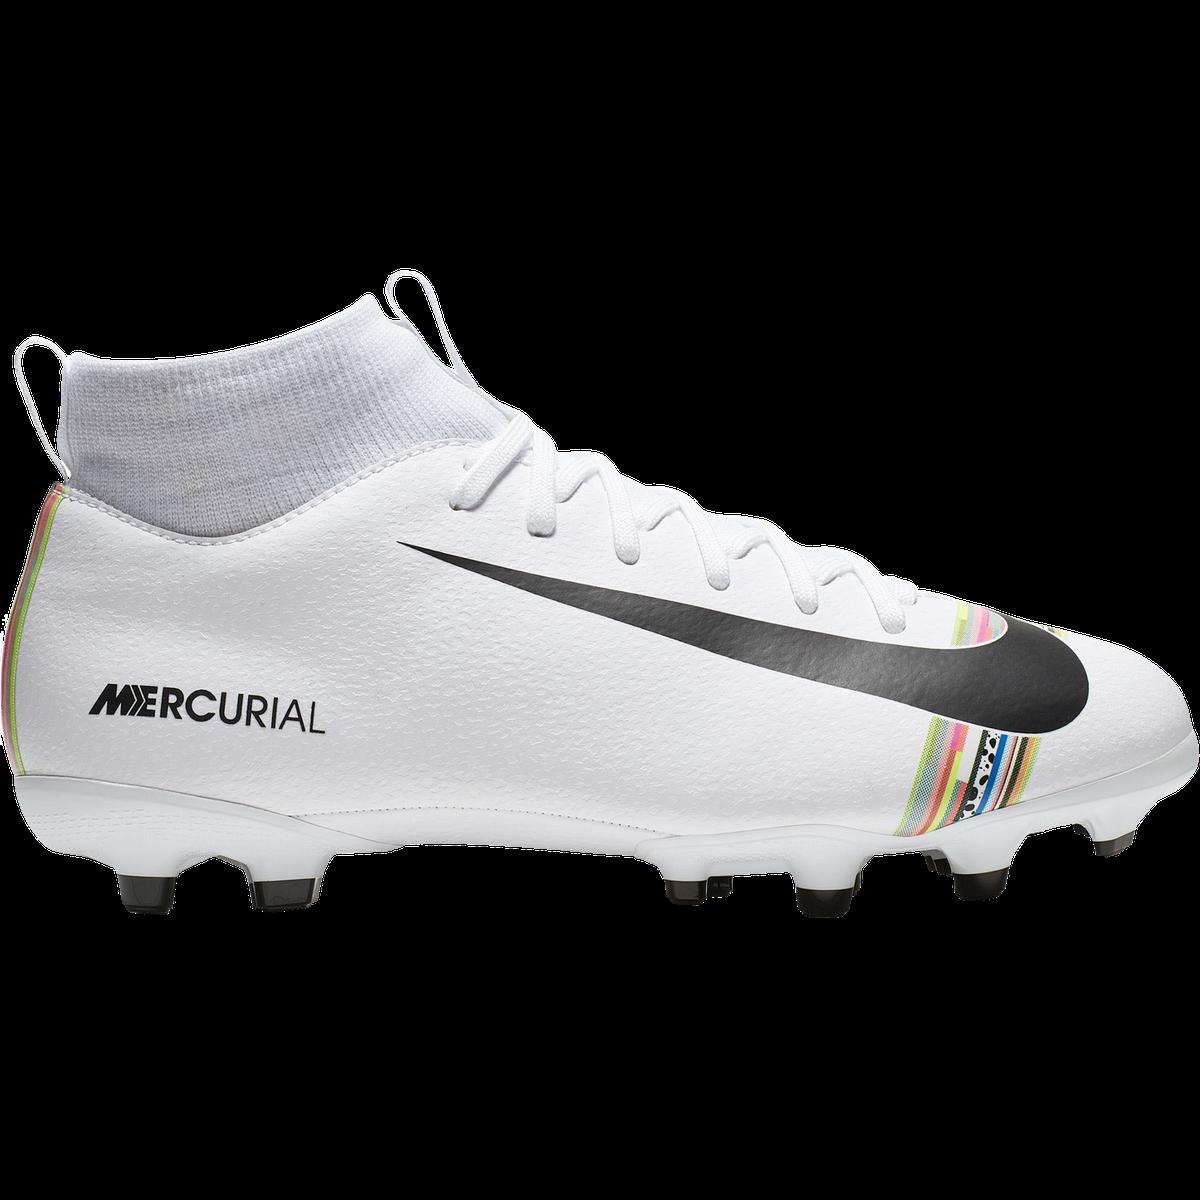 745957a2 Nike Superfly 6 Academy GS MG/Q2 19, fotballsko junior - Blå - Fotballsko |  XXL